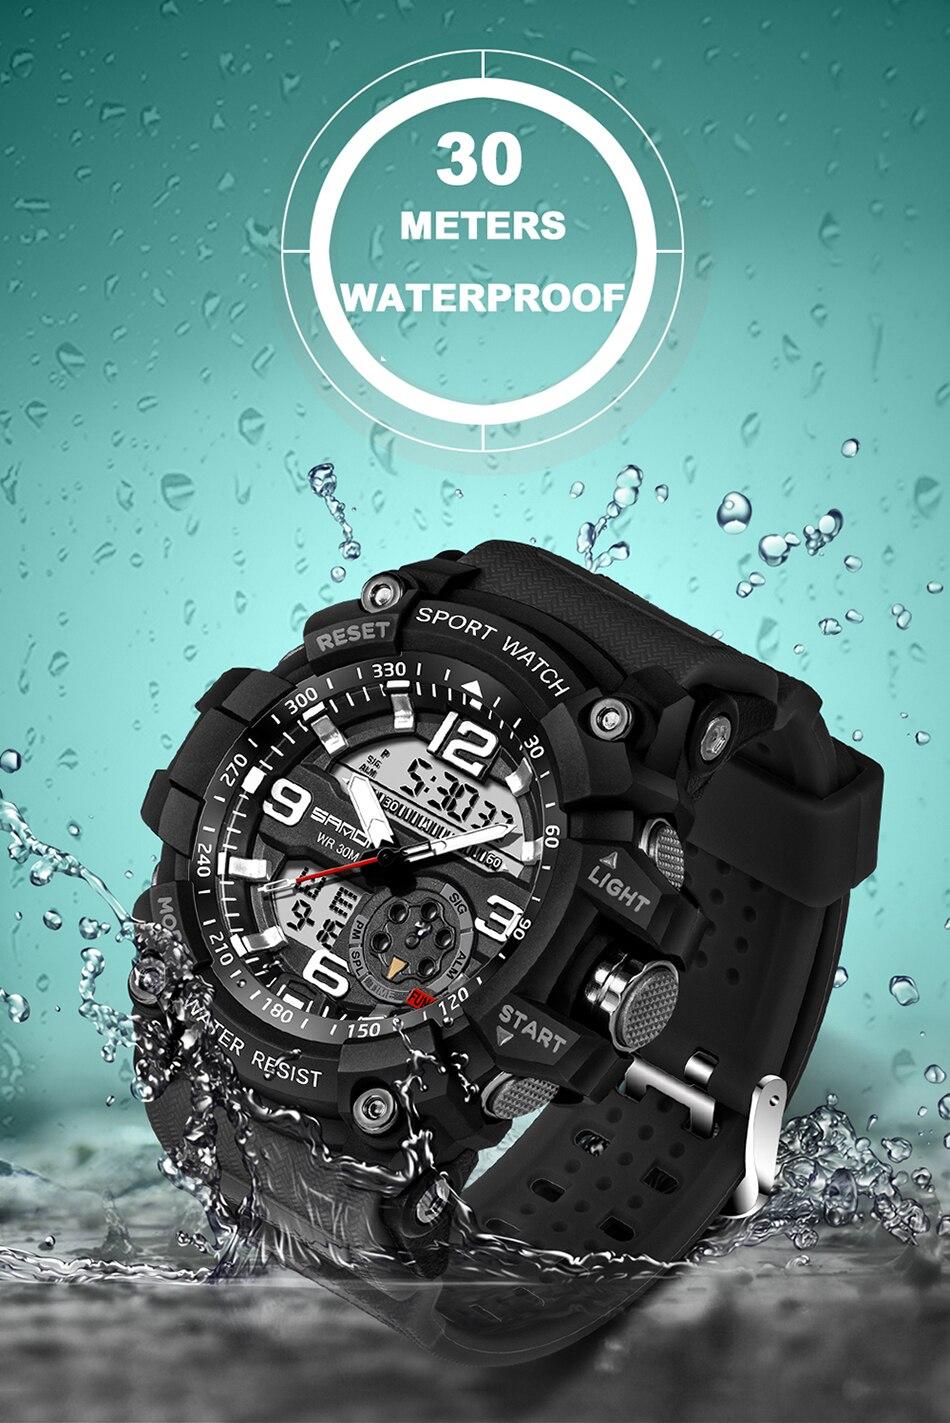 HTB15jurl3KTBuNkSne1q6yJoXXaf SANDA 759 Sports Men's Watches Top Brand Luxury Military Quartz Watch Men Waterproof S Shock Wristwatches relogio masculino 2019